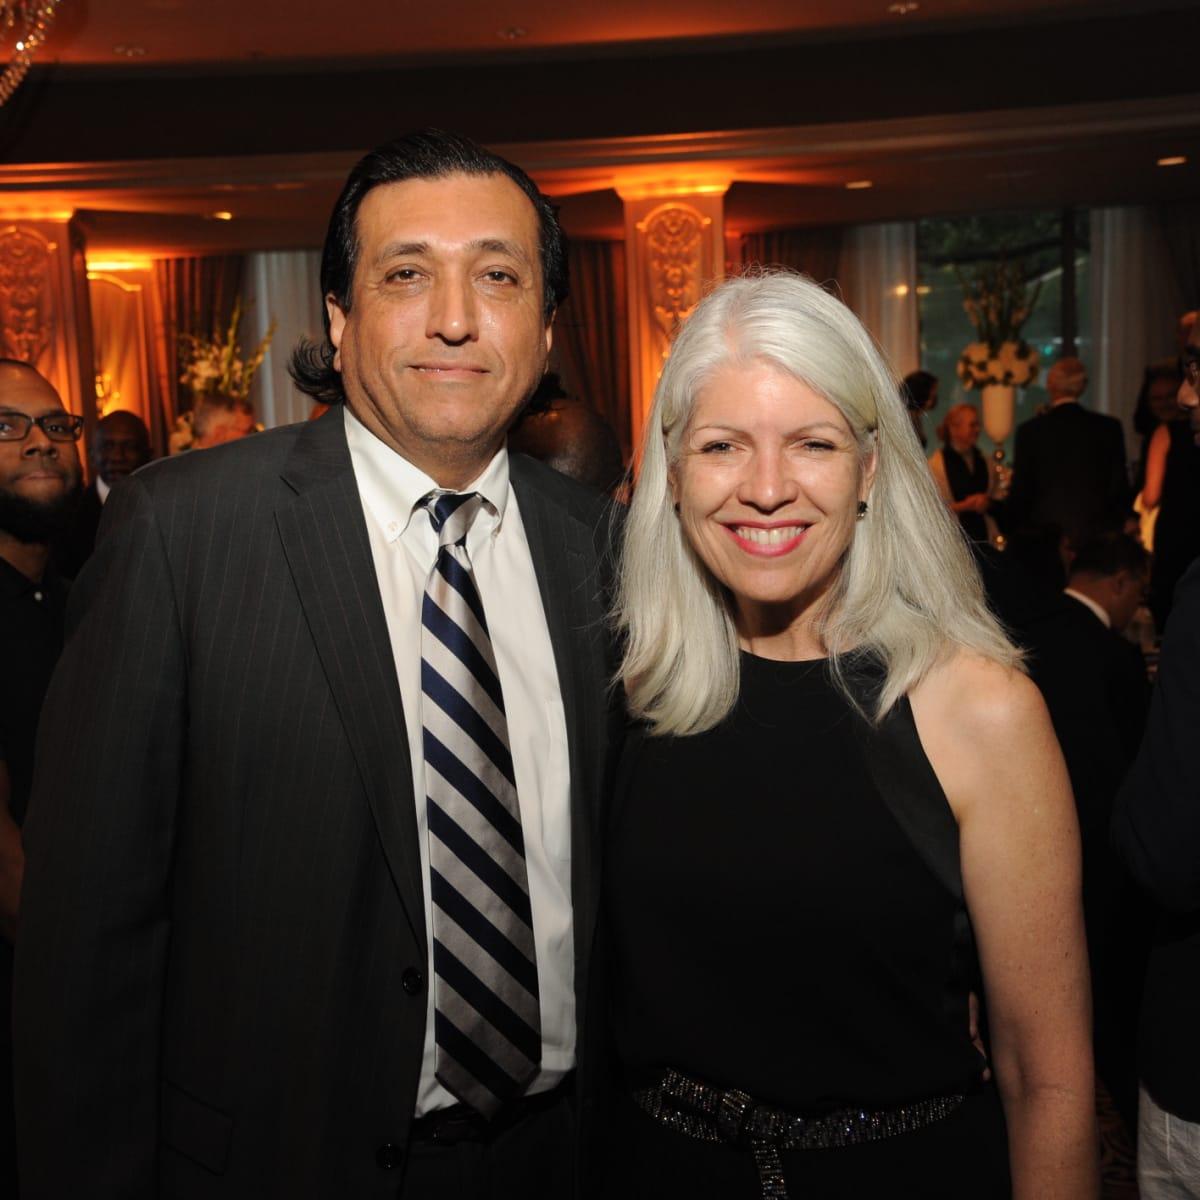 Houston Arts Alliance dinner 5/16, Tim Cisneros, Carla Cisneros